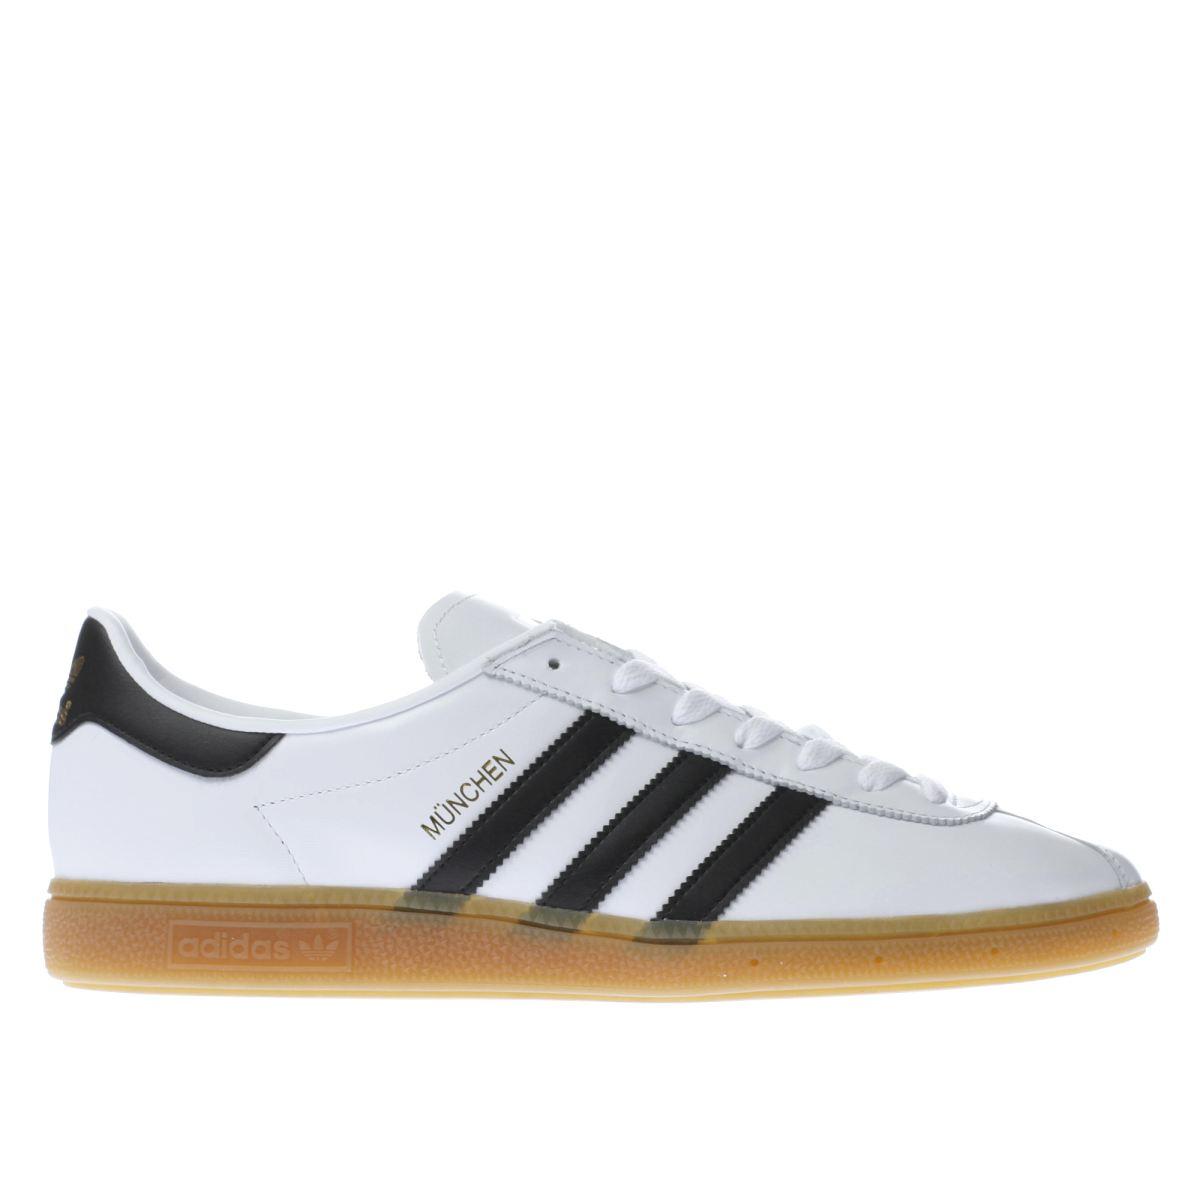 adidas white & black munchen trainers